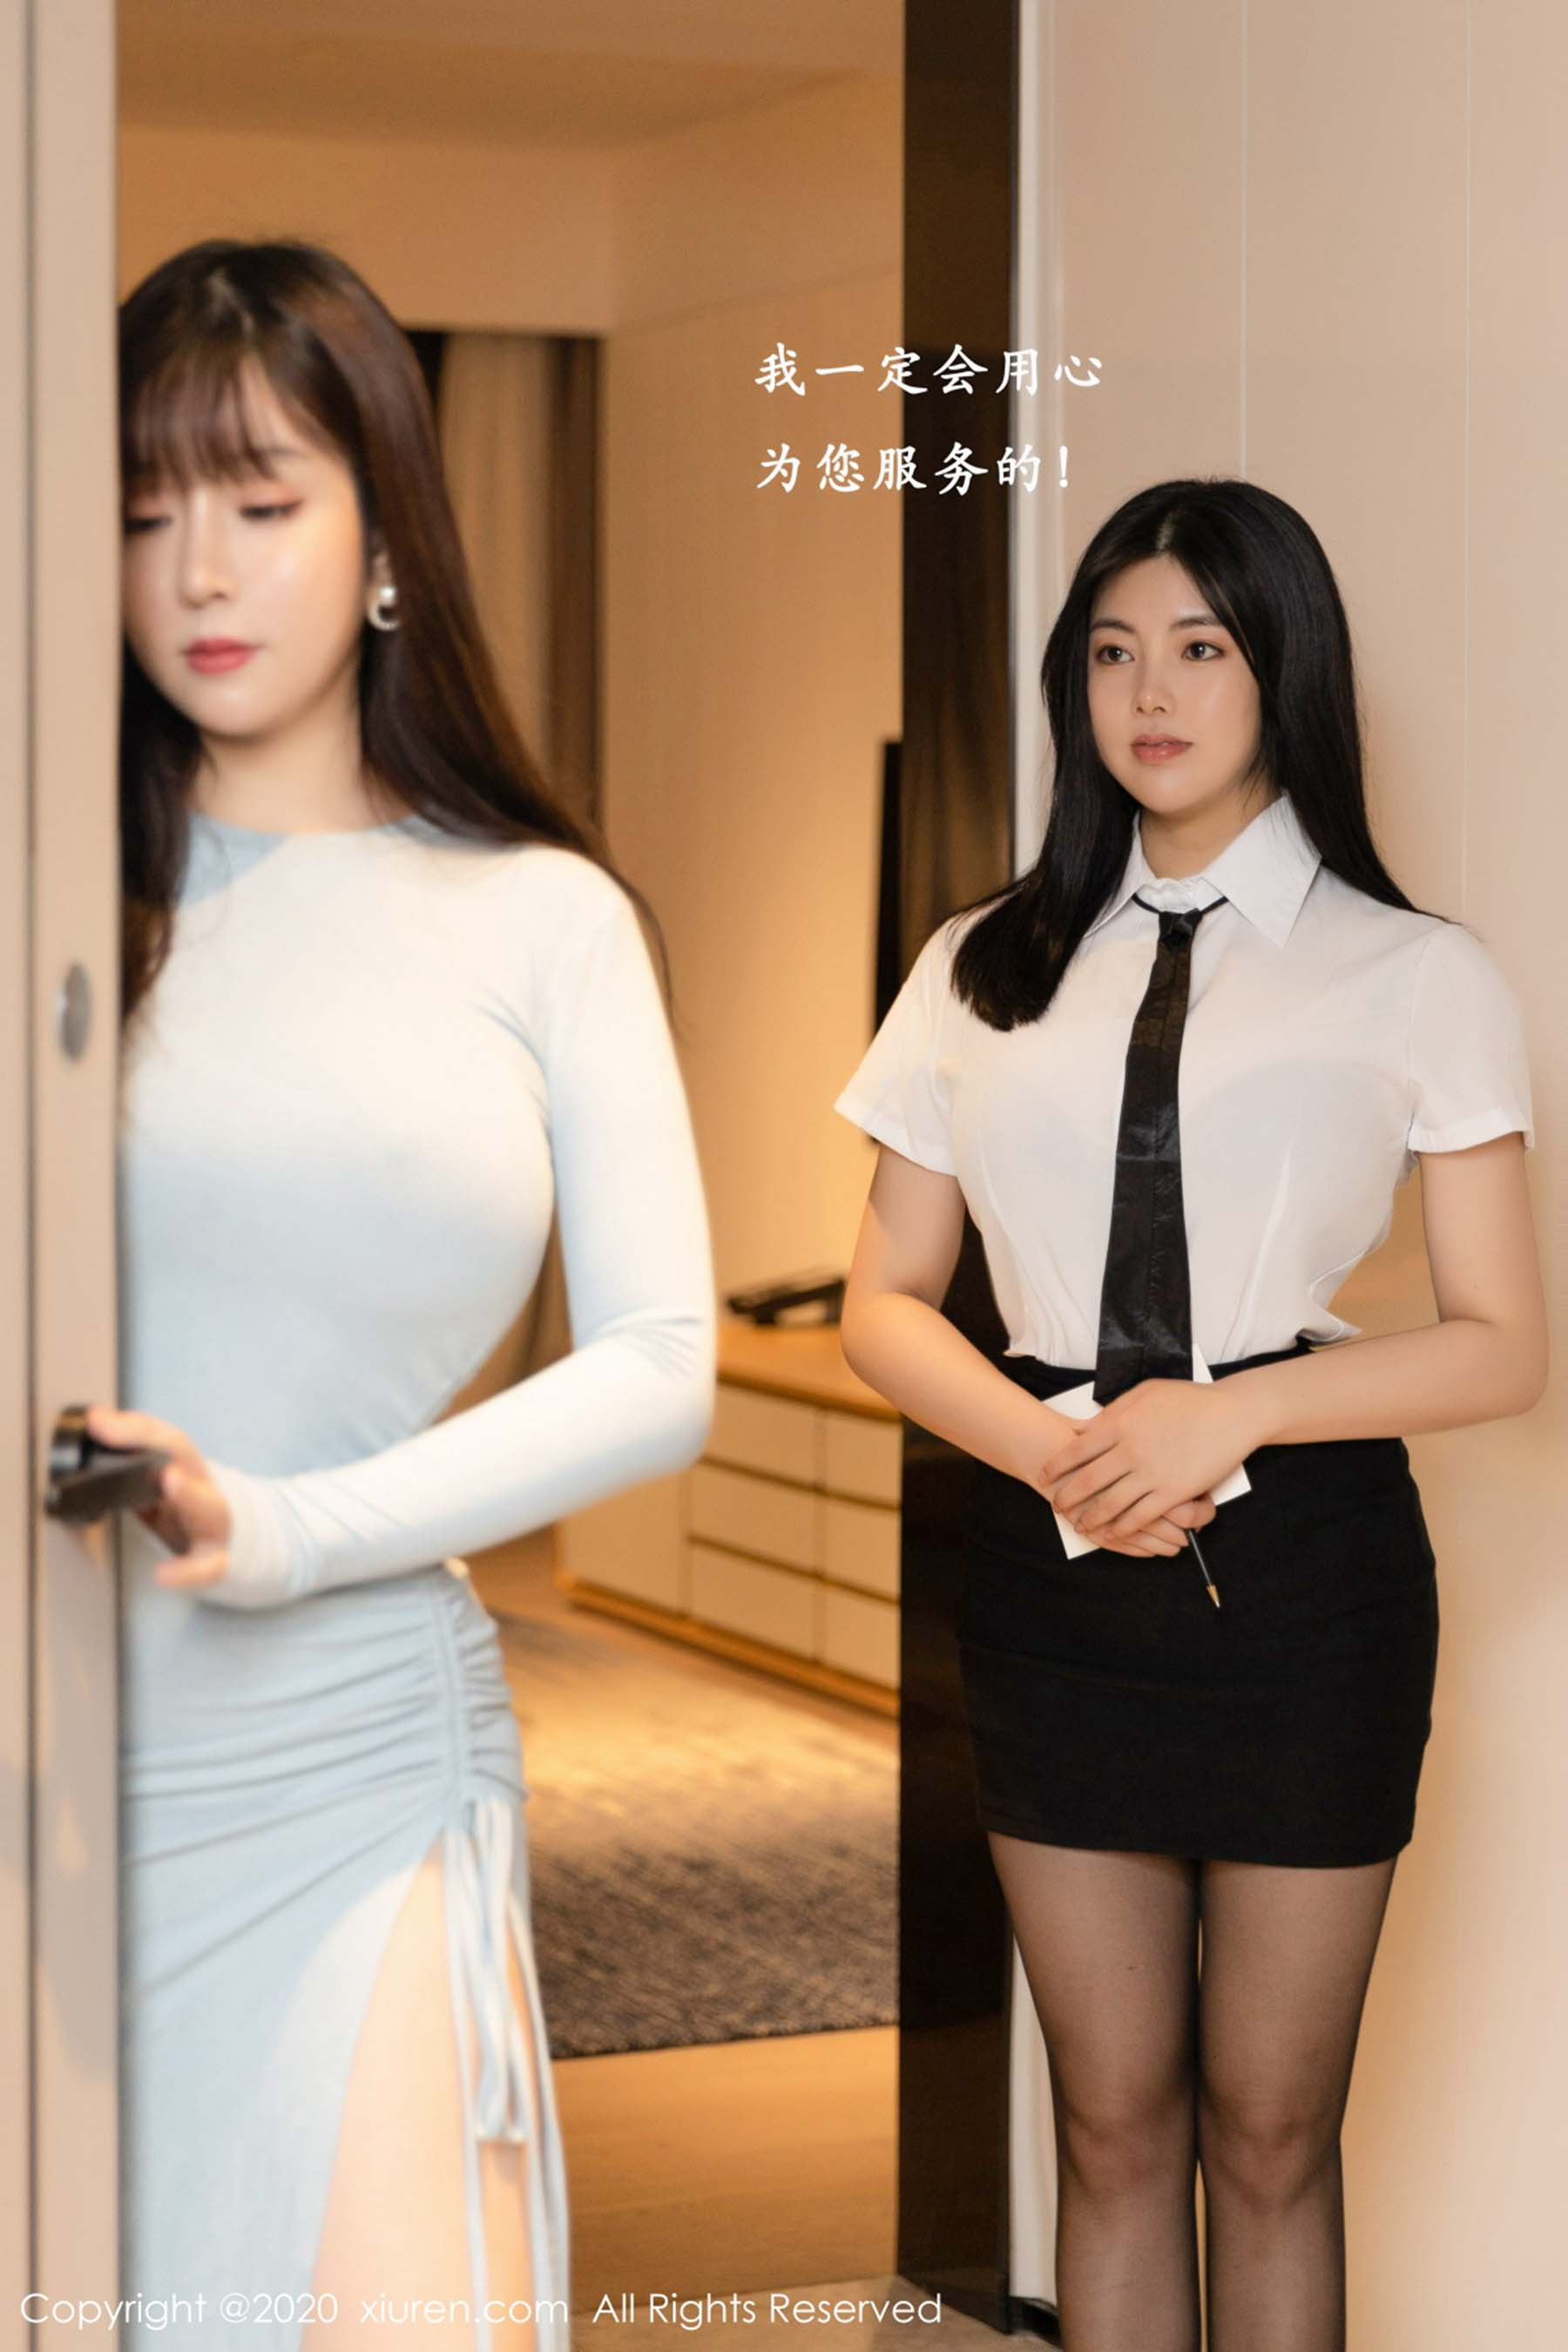 [XiuRen秀人網] 2020.11.20 No.2809 娜露Selena王雨純模特合集酒店劇情系列 - 貼圖 - 清涼寫真 -